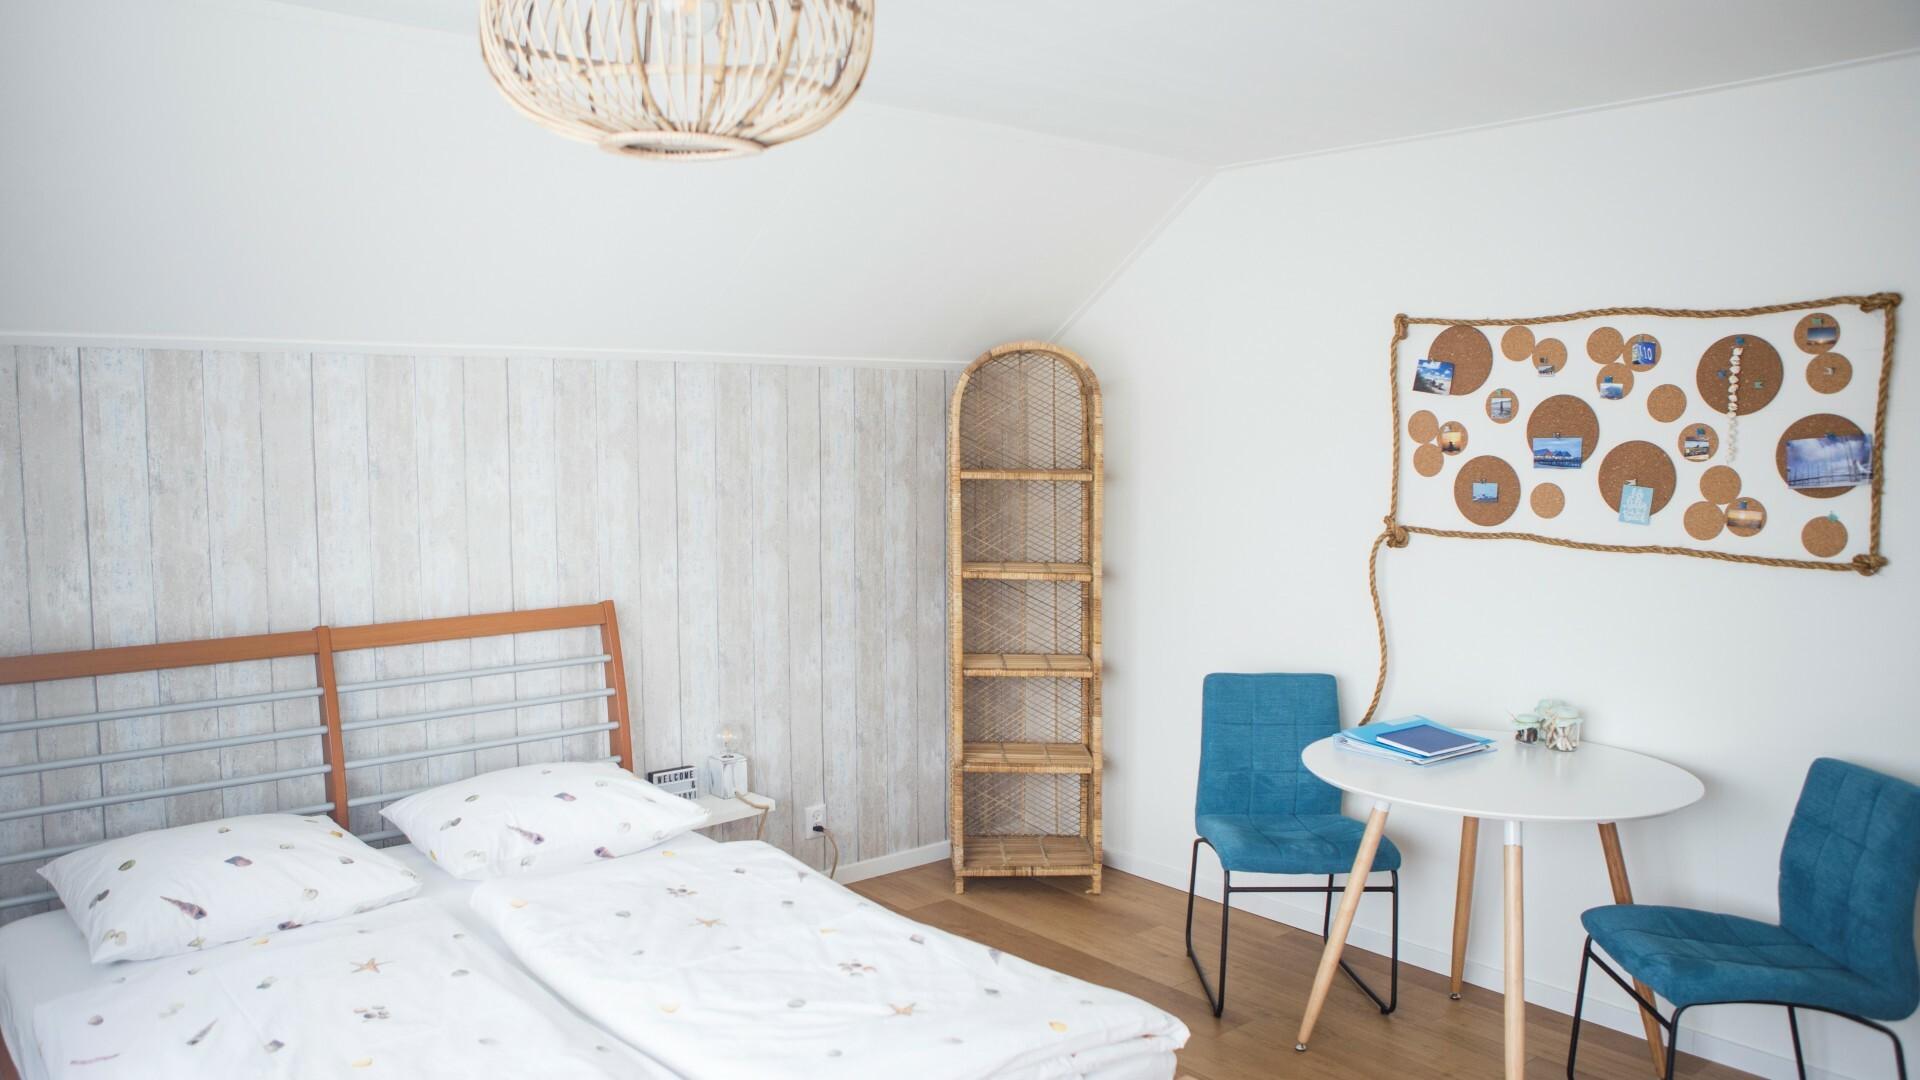 Strandkamer Bed en breakfast Enjoytexel VVV Texel